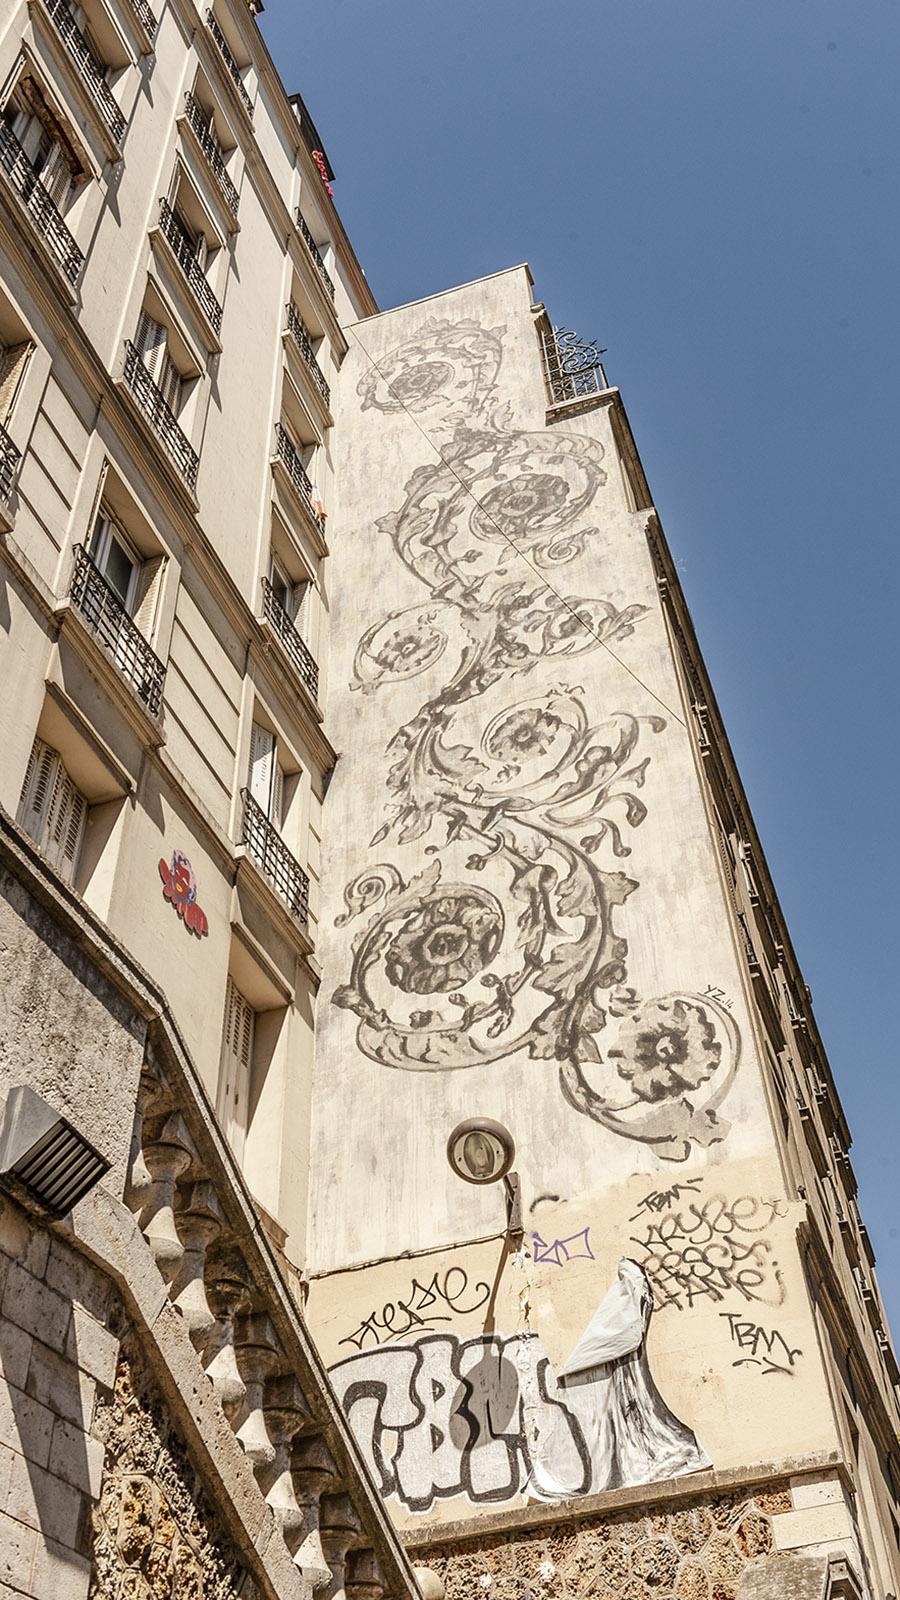 Tolbiac: Street Art in der Rue de Chevaleret